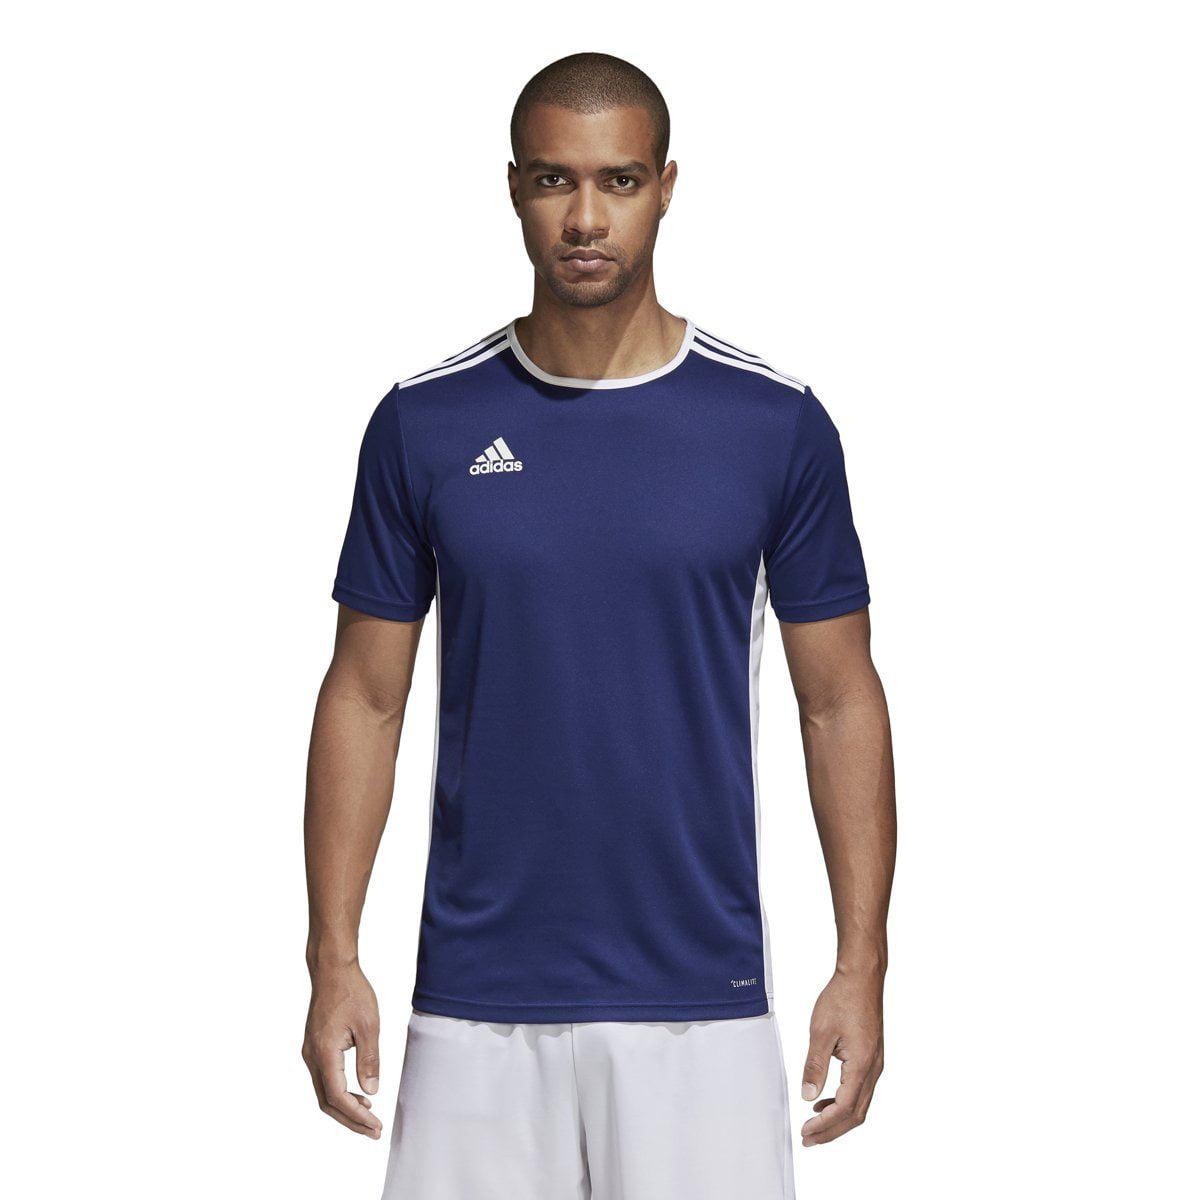 adidas Men's Entrada 18 Jersey | CF1036 - Walmart.com